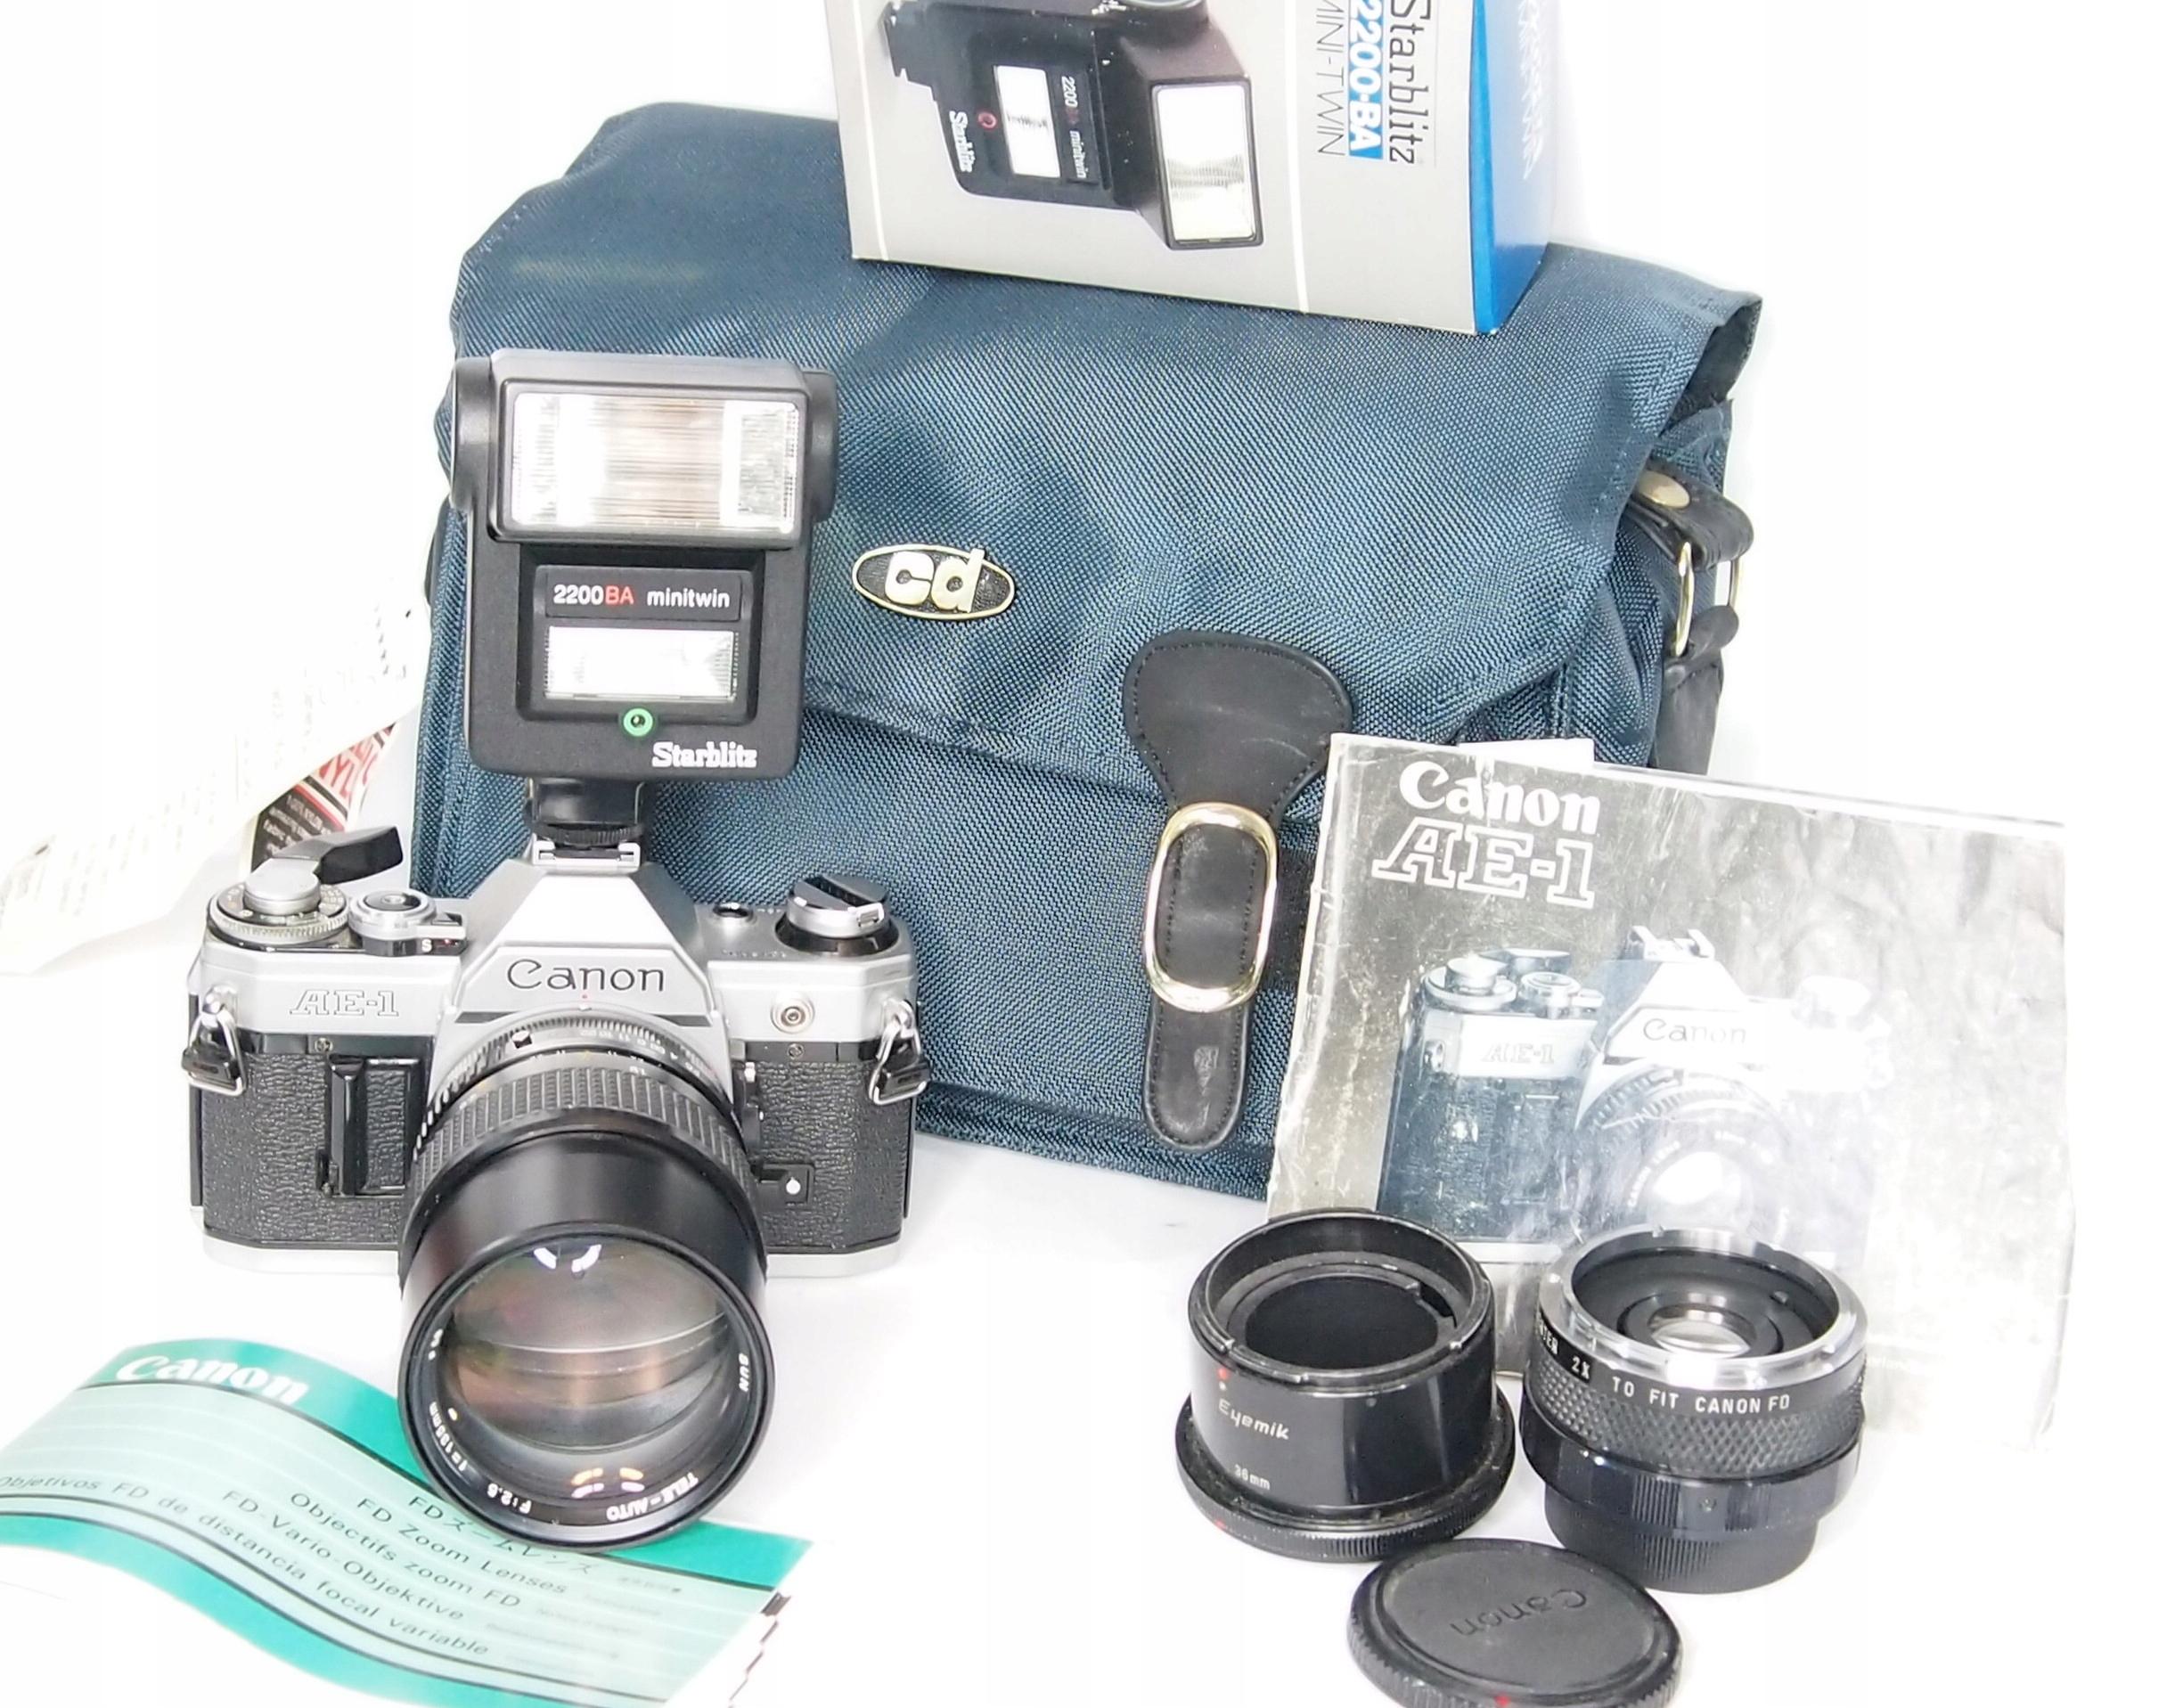 Aparat kolekcjonerski AE-1 Canon zestaw 2.5 135mm